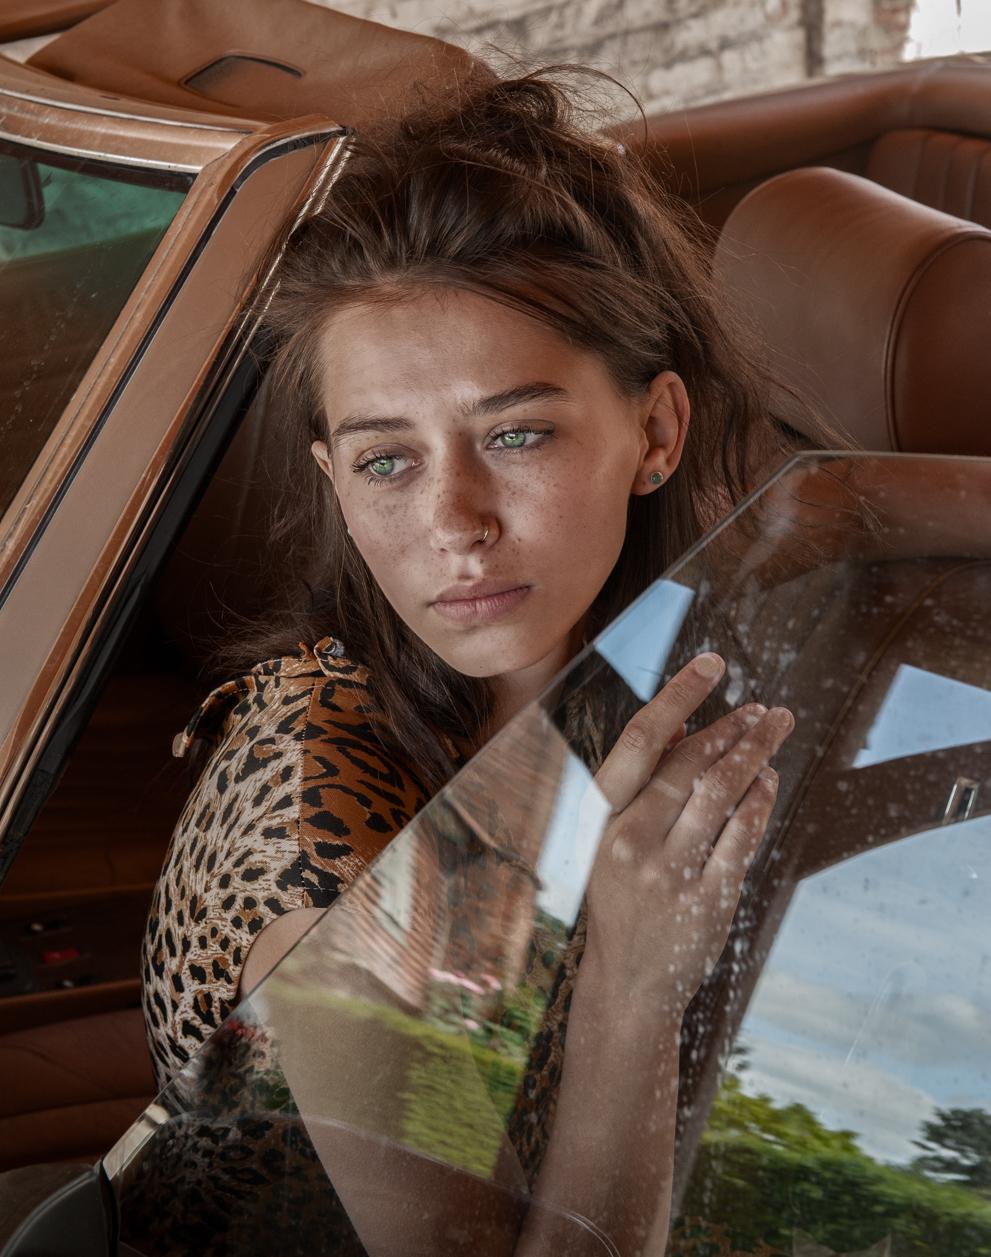 Fashion portrait by Farnham, Surrey based fashion photographer James Muller